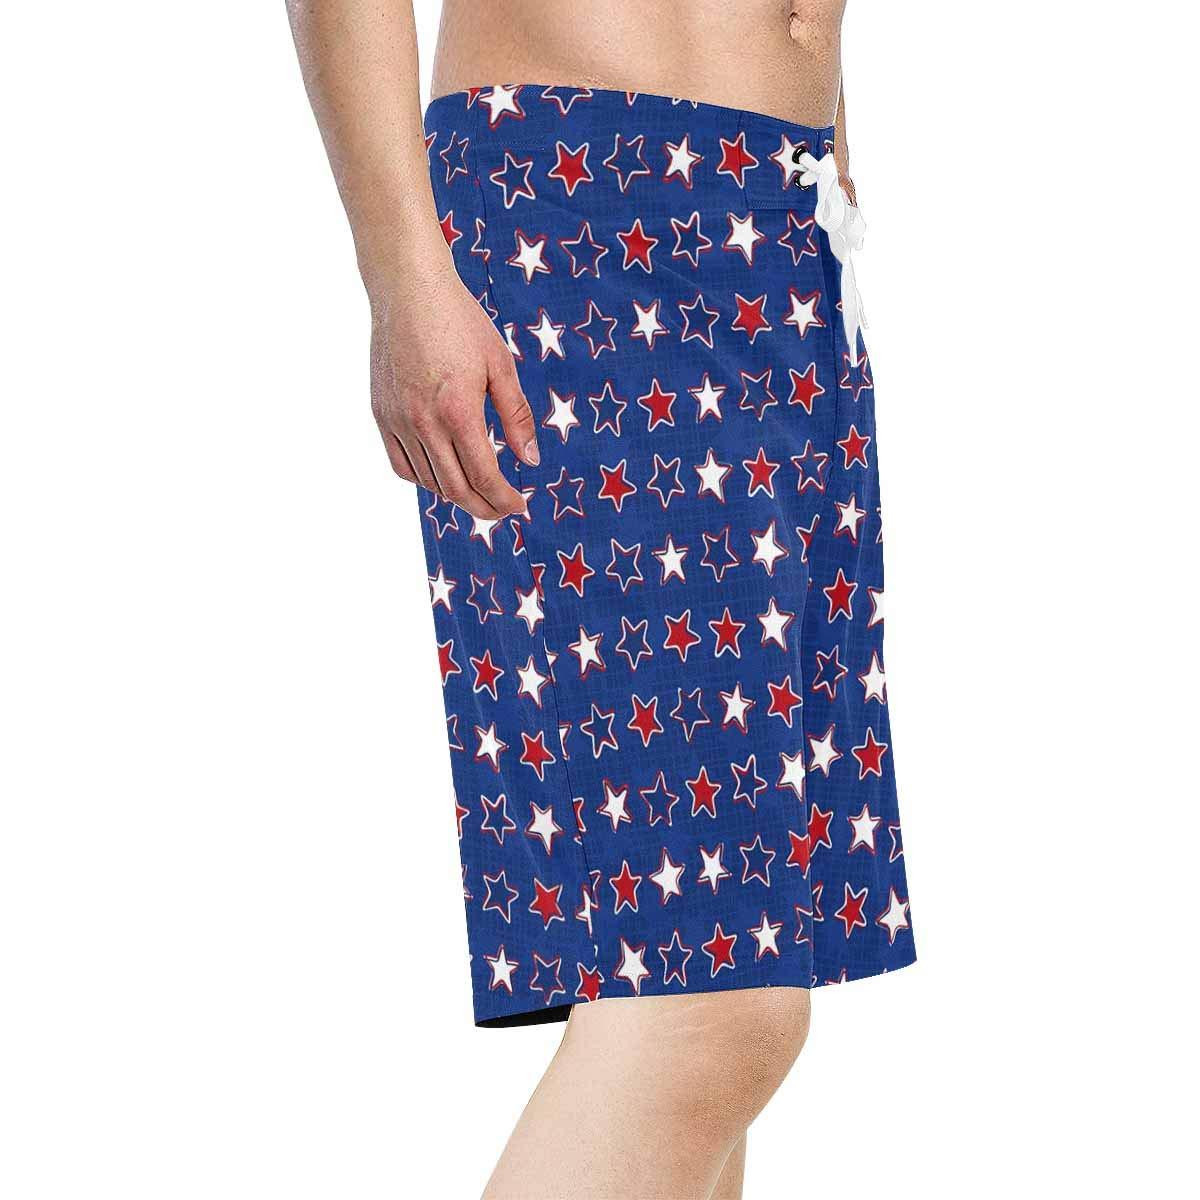 INTERESTPRINT Mens Beach Shorts White Red Blue Stars Quick Dry Swim Trunks XS-6XL